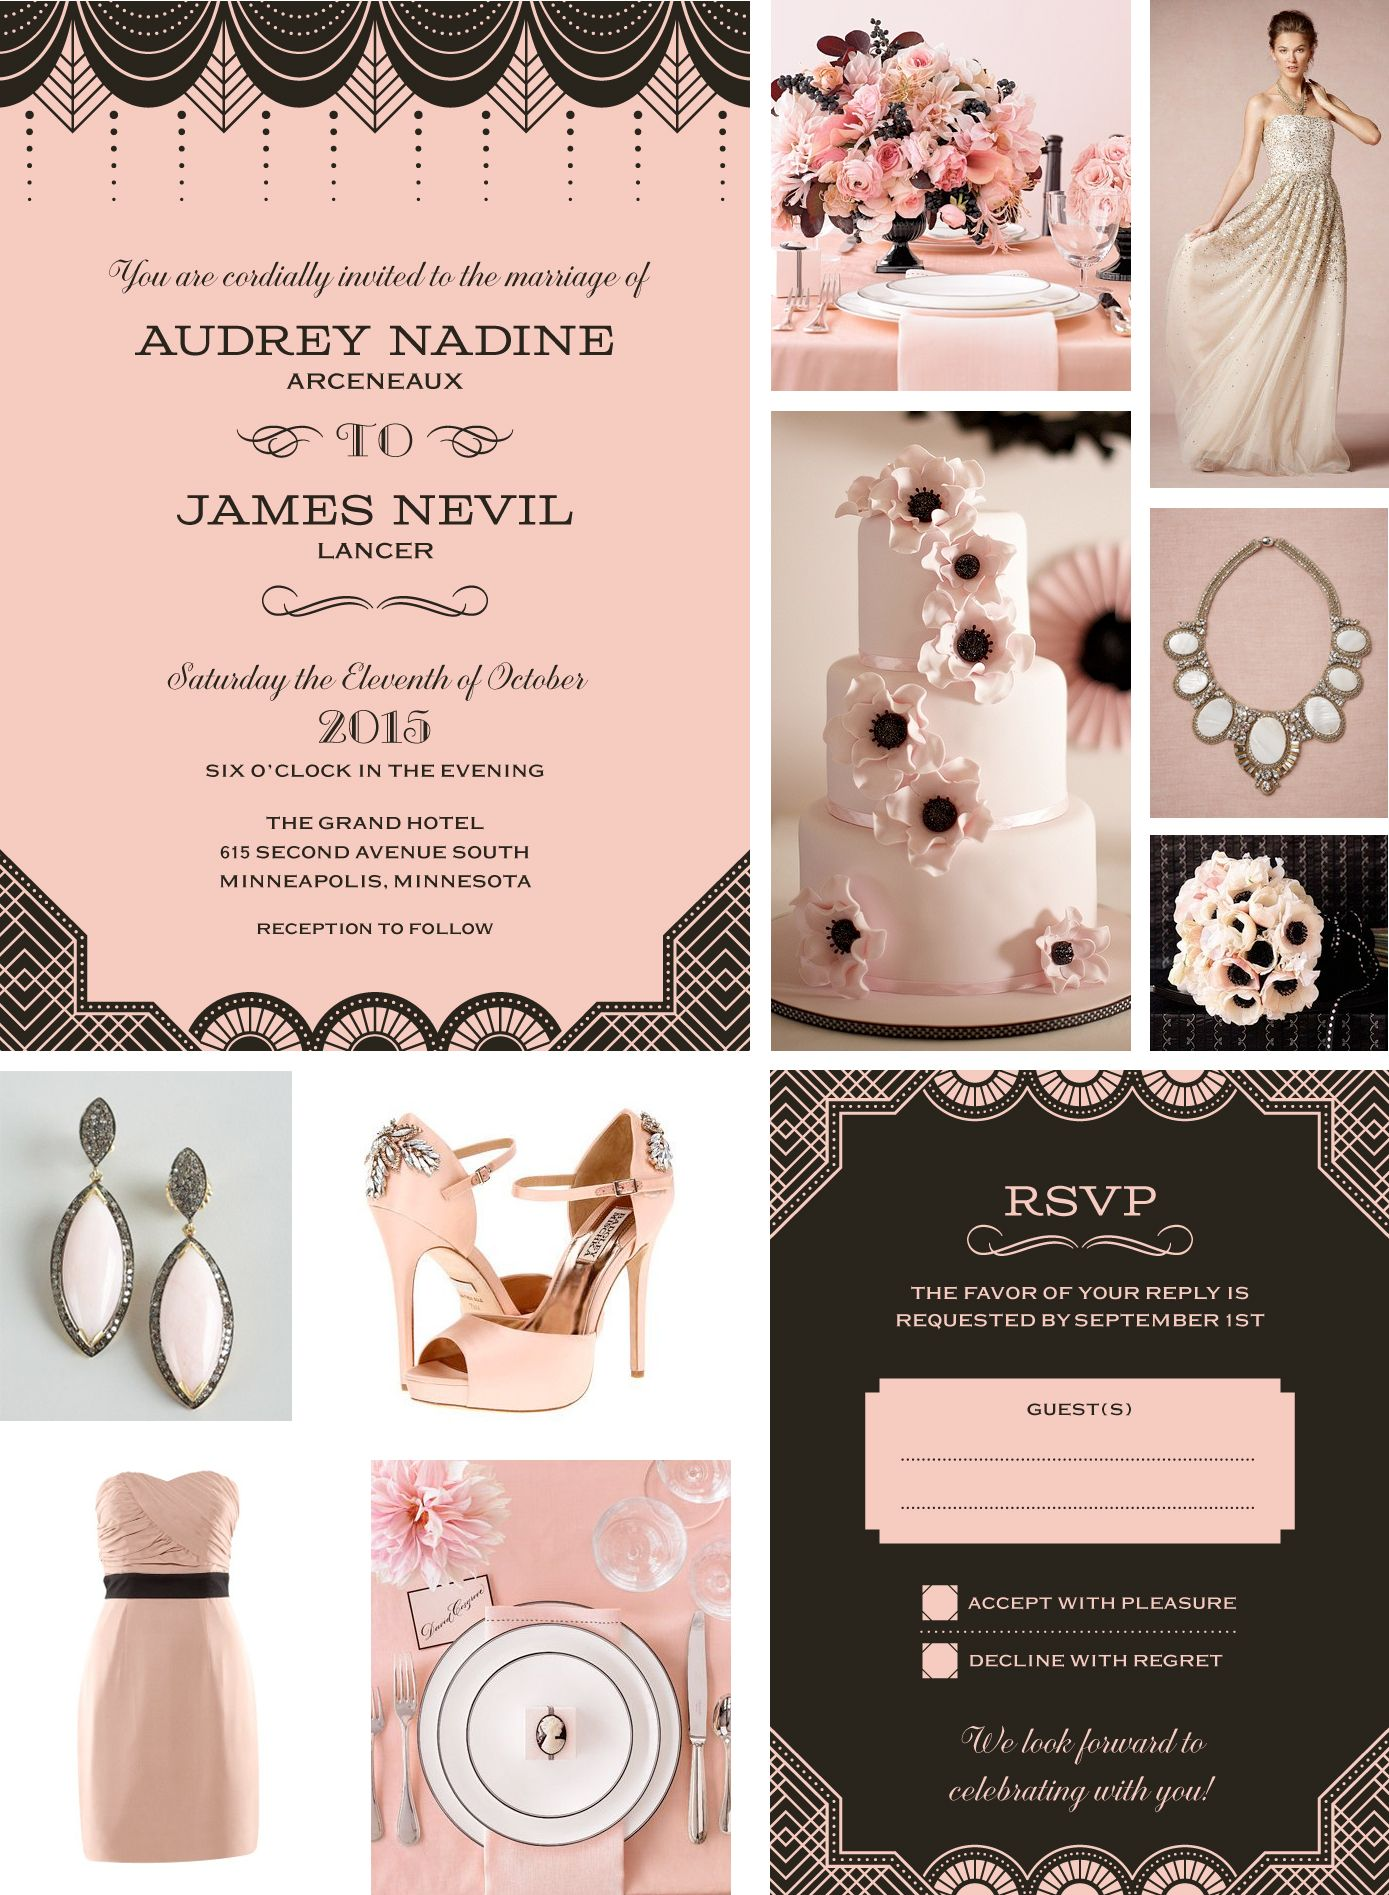 gatsby wedding invitations ivory black and light pink wedding decoration ideas Photo credits clock wise